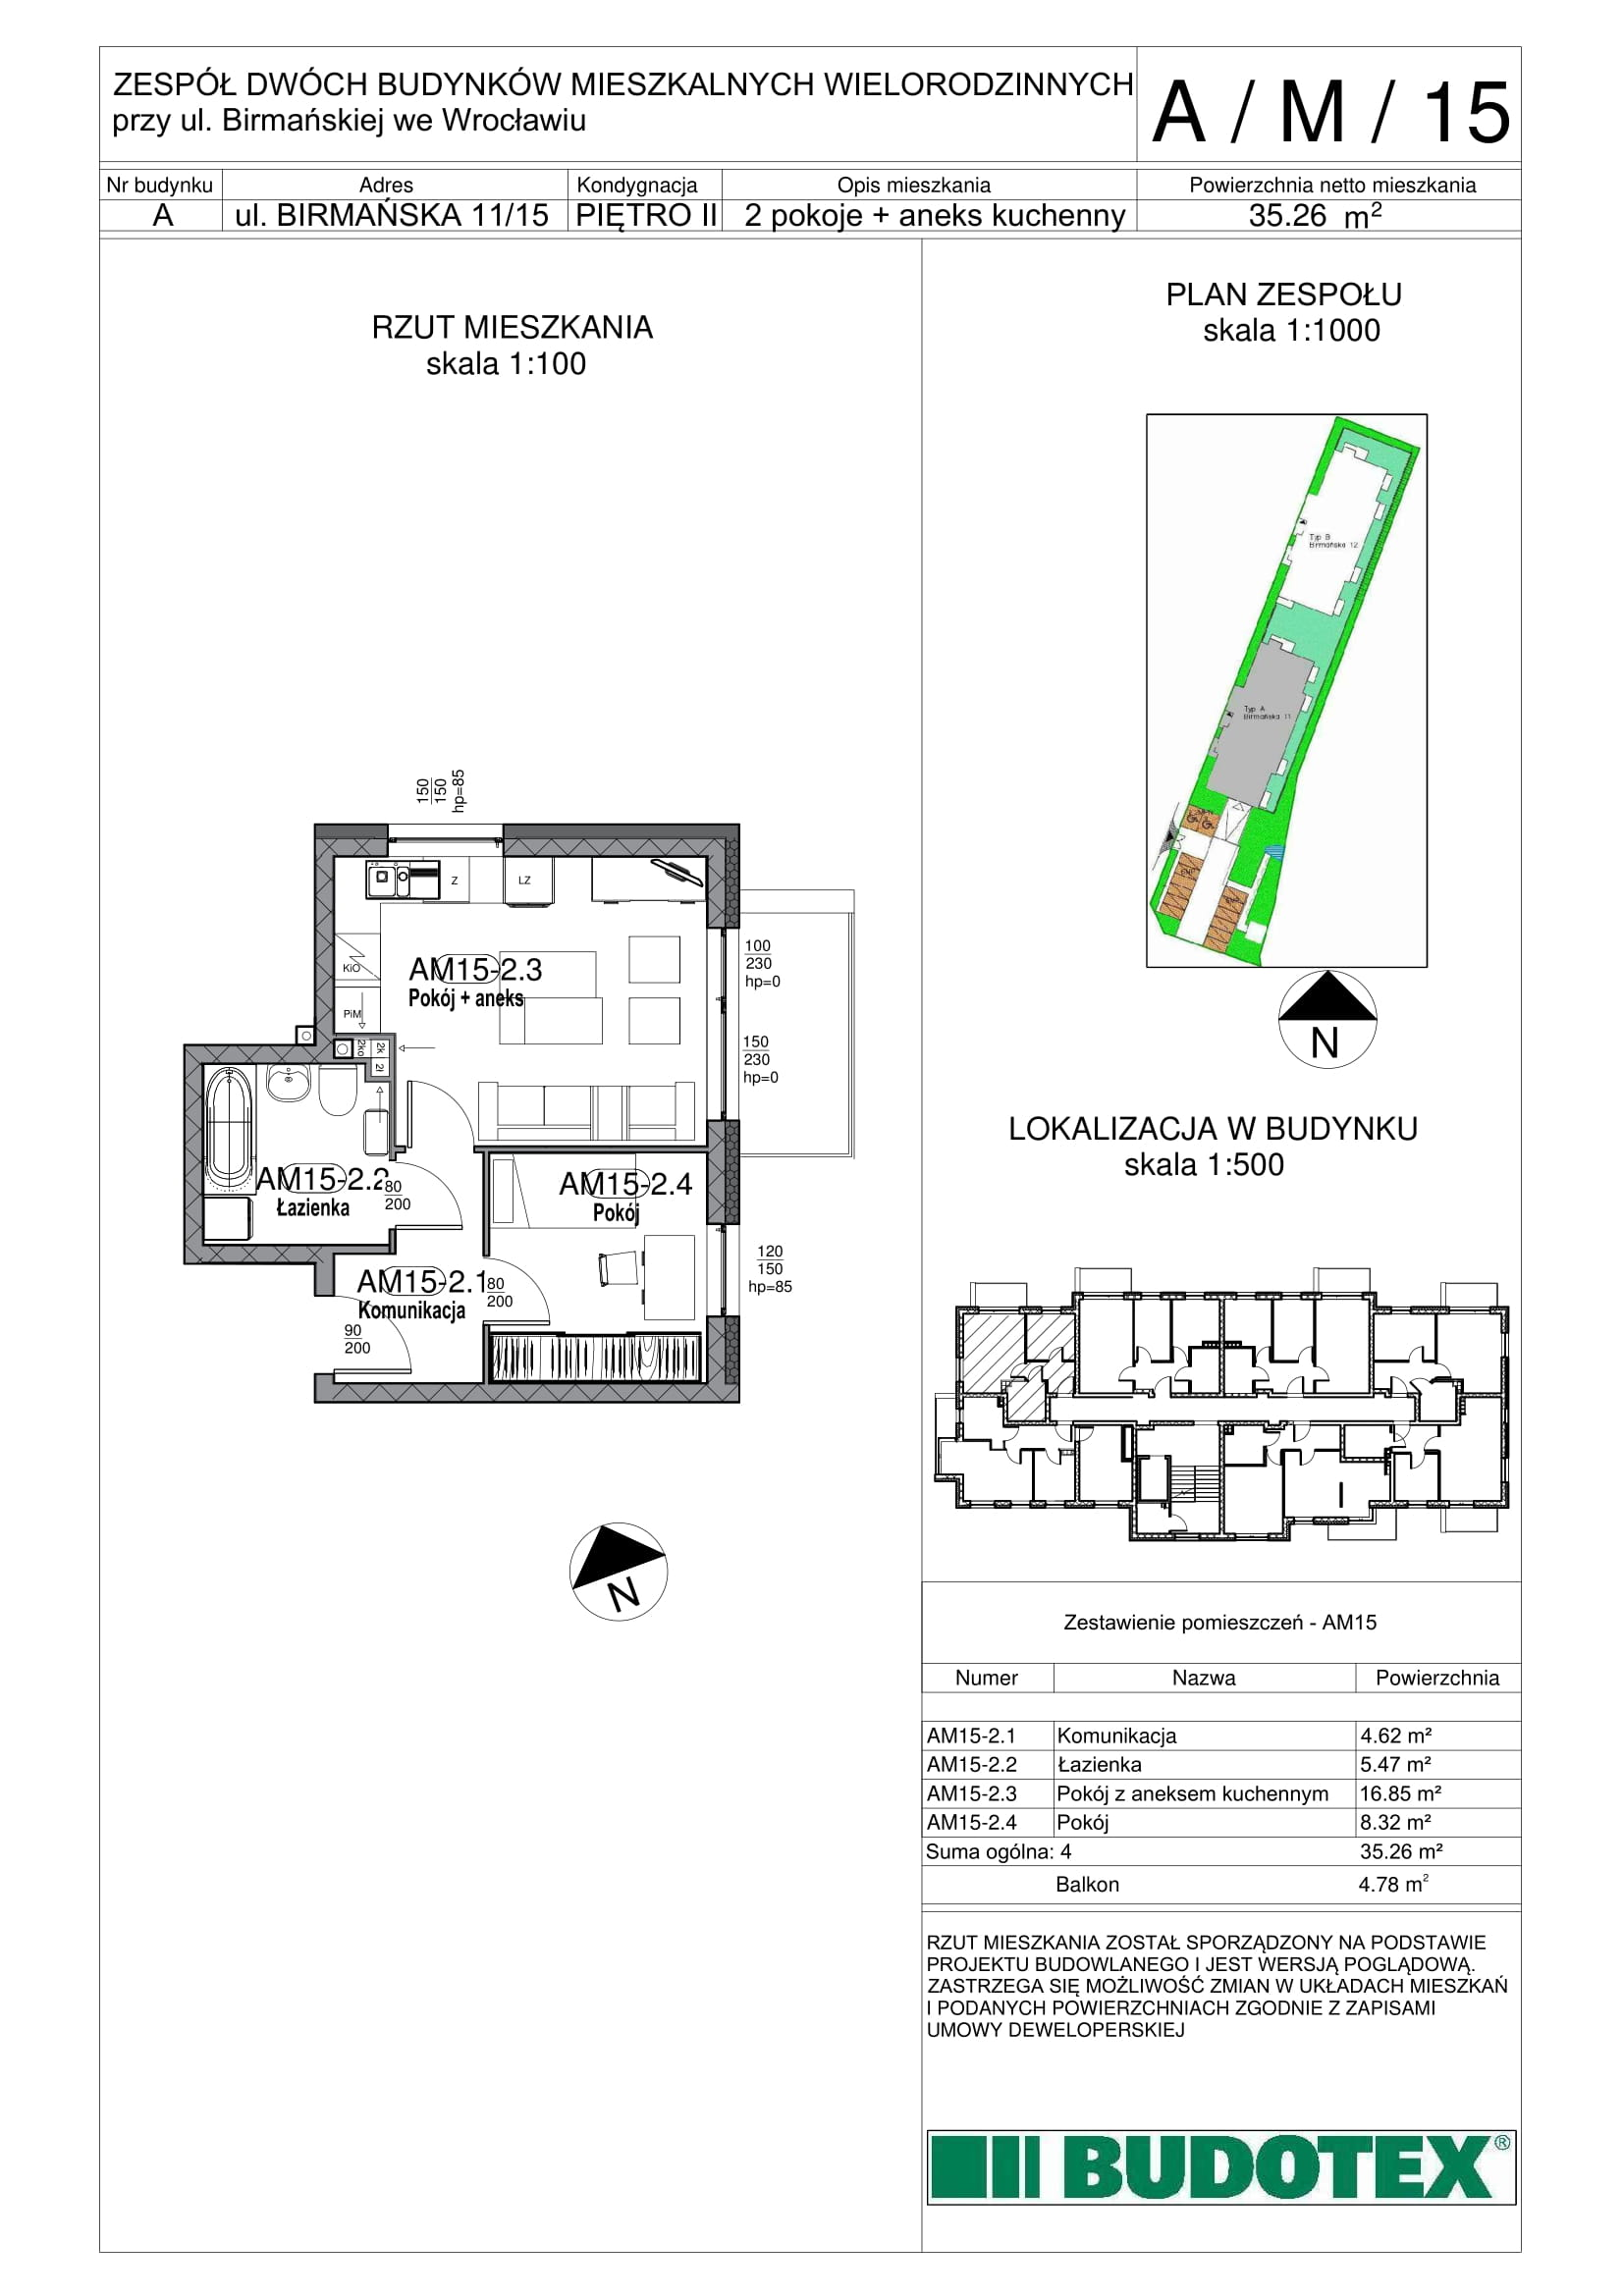 Mieszkanie nr A/M/15